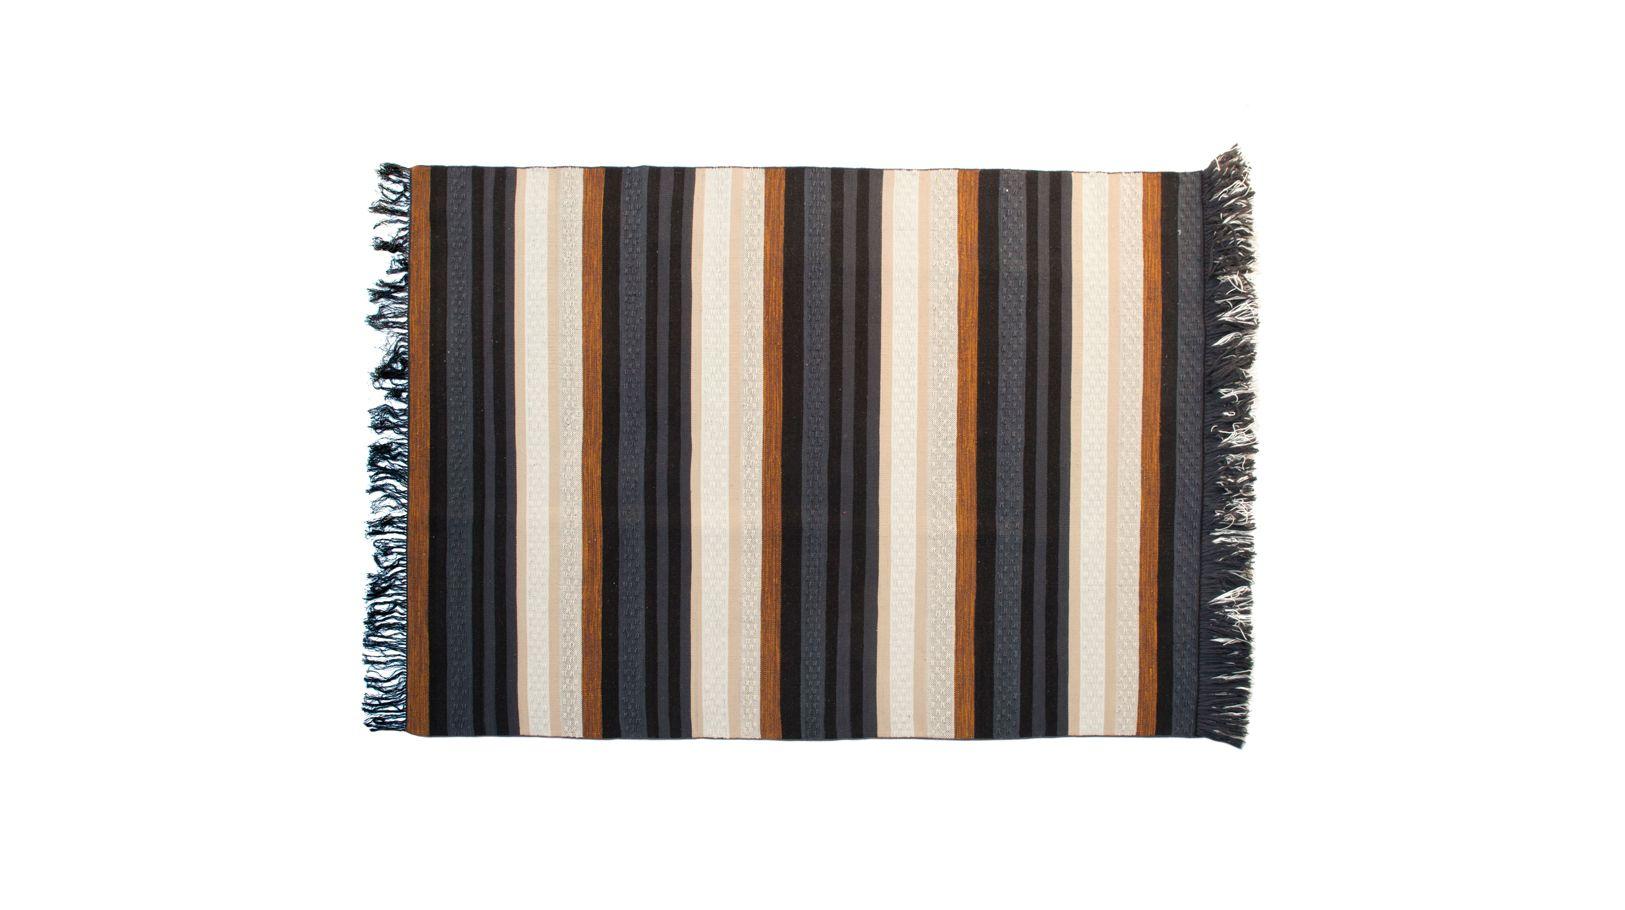 pixl miroir b cherregal roche bobois. Black Bedroom Furniture Sets. Home Design Ideas